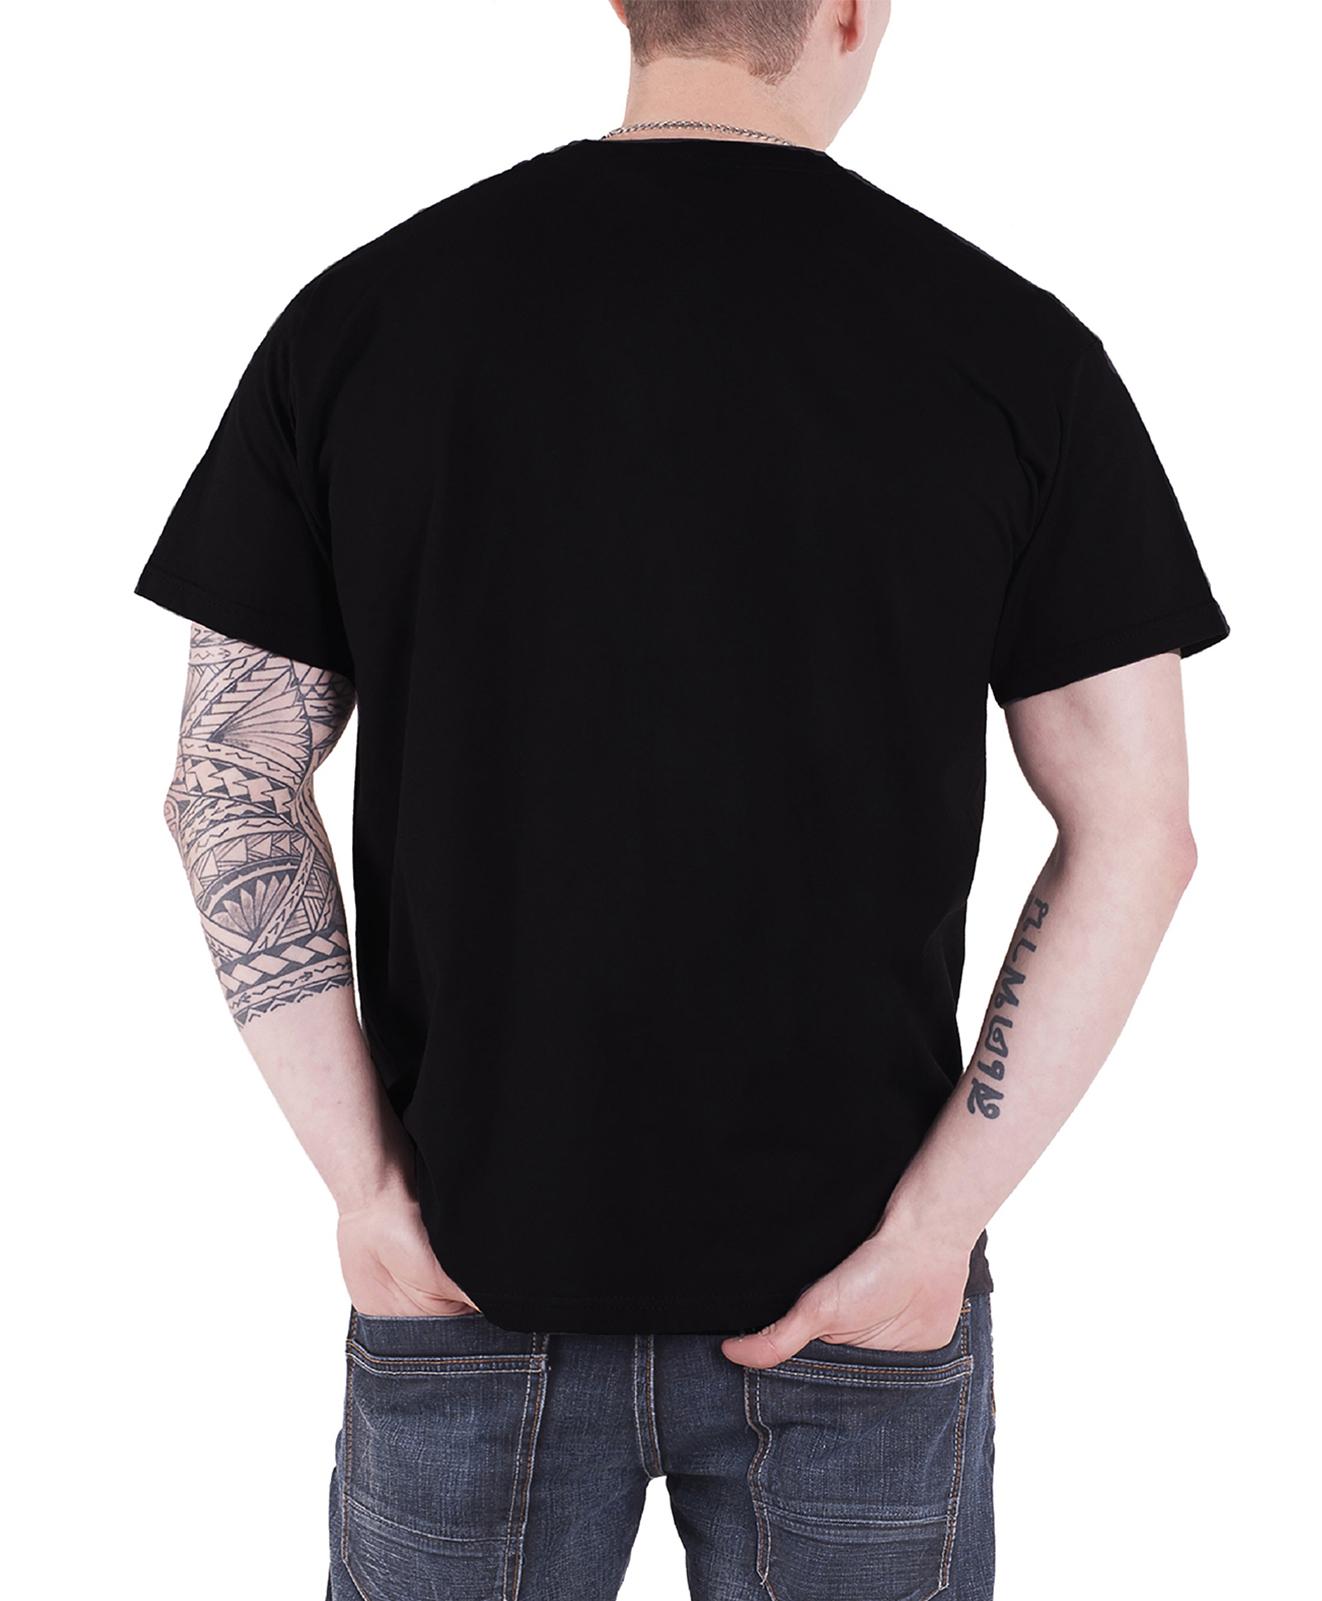 Official-Gas-Monkey-Garage-T-Shirt-Official-GMG-Logo-Kustom-Builds-new-Mens Indexbild 69